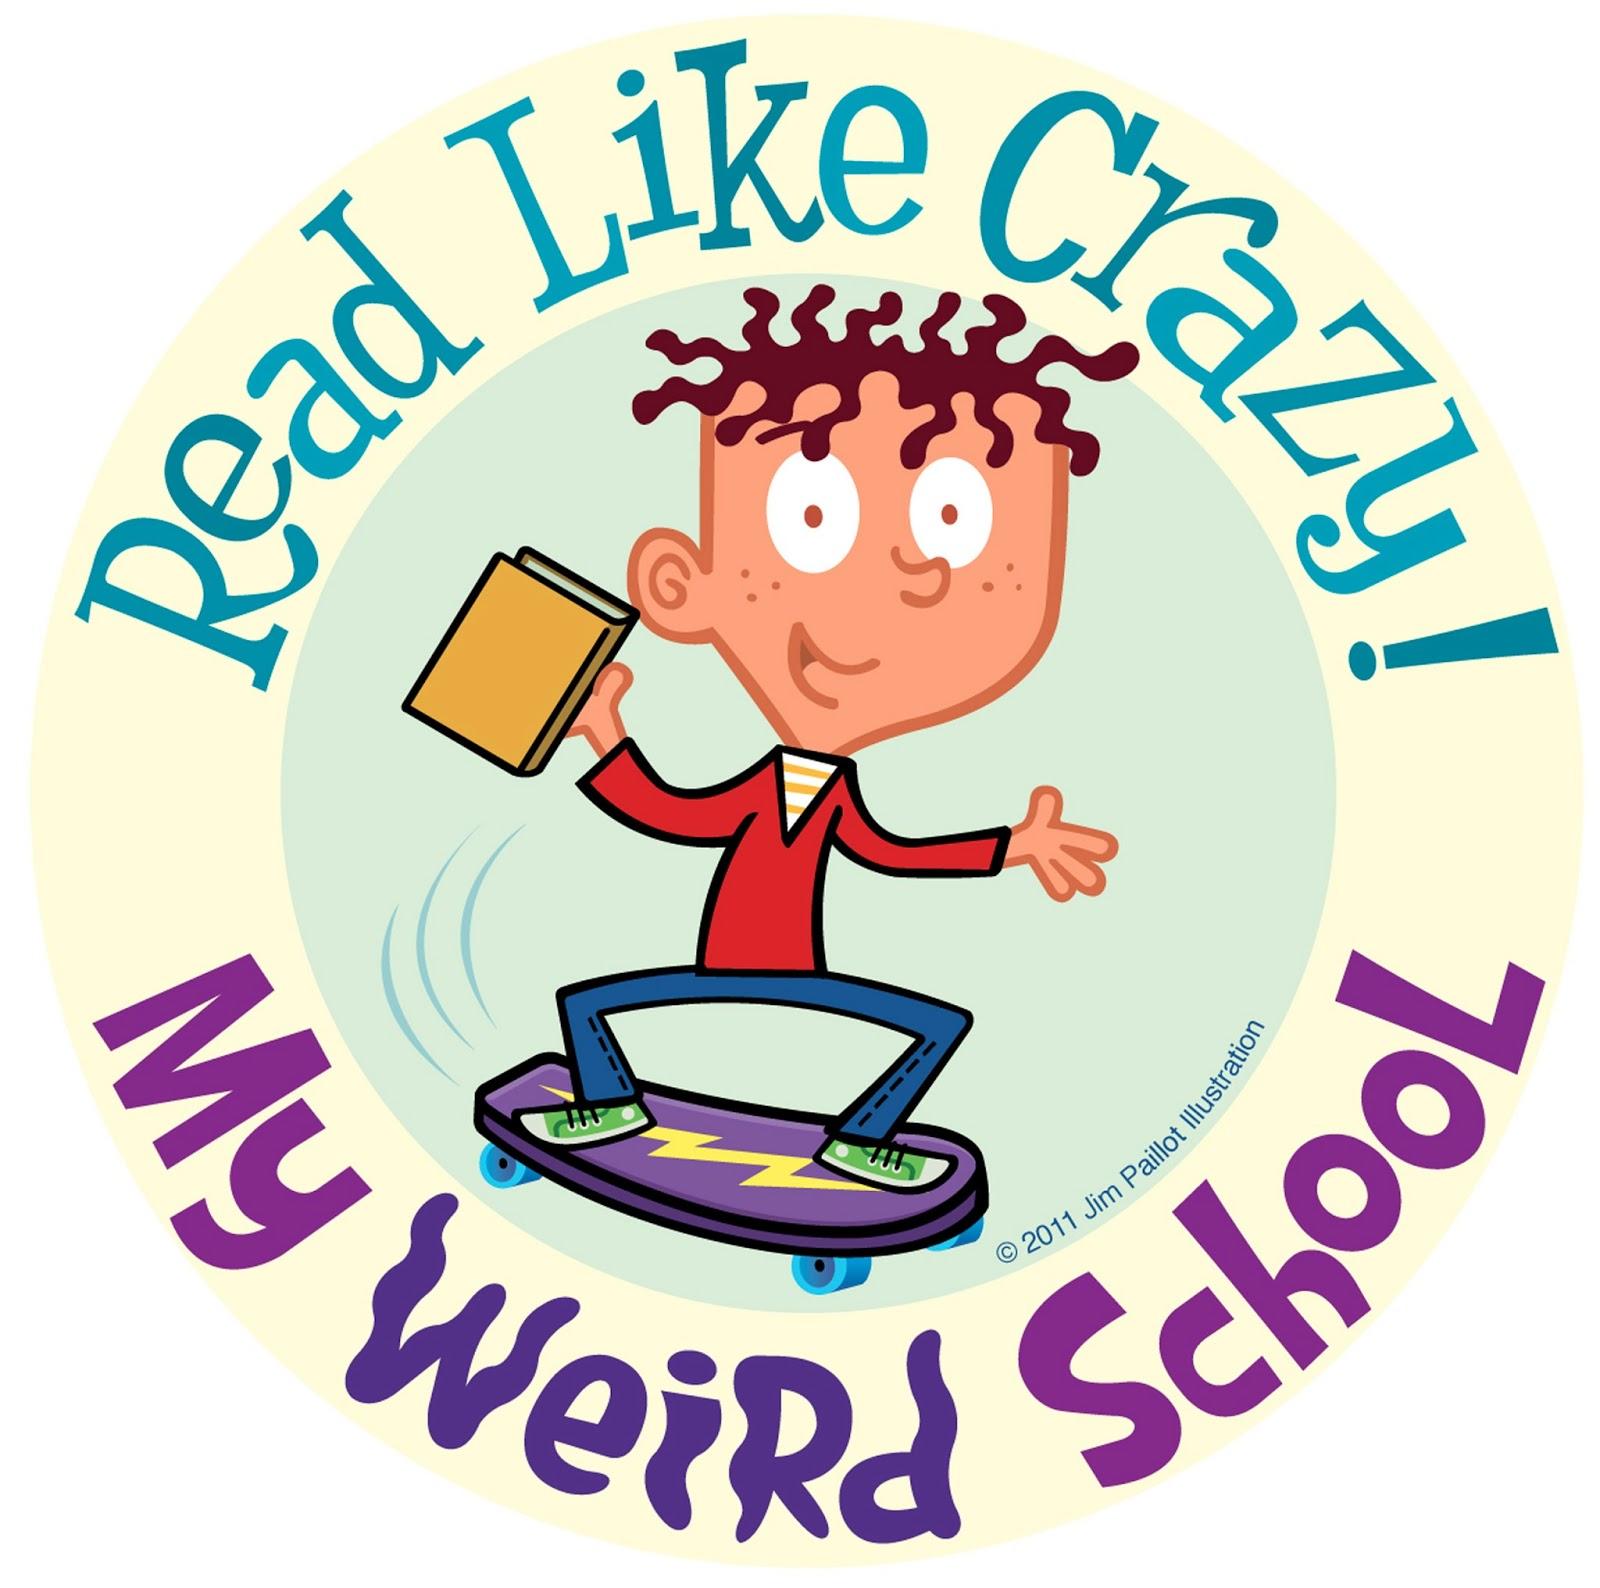 My Weird School by Dan Gutman, Books 1-21 + Specials, Writing Tips, 26 Volumes